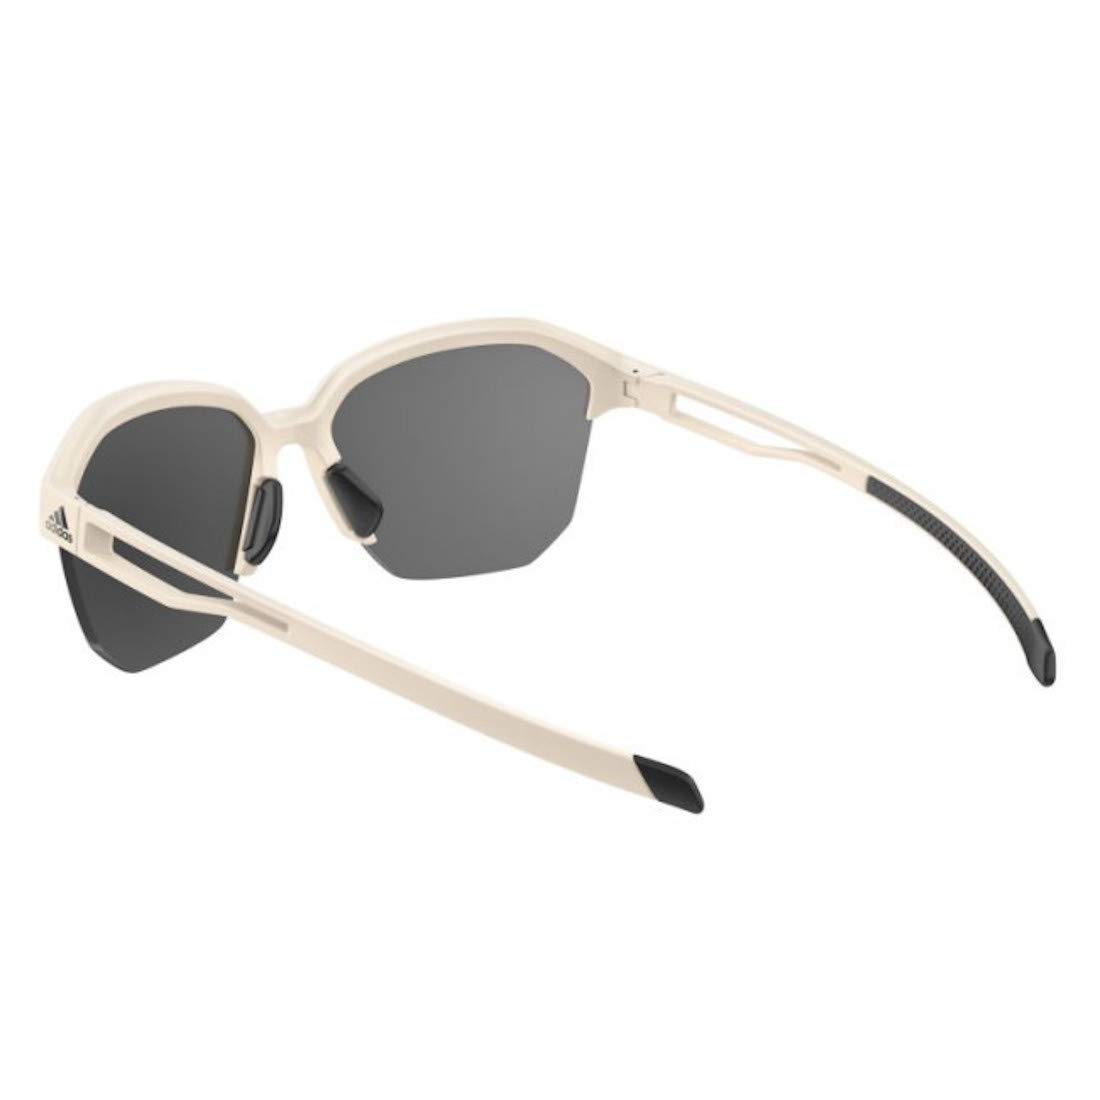 Raw White//Grey Lens Adidas Sunglasses AD5075 Exhale 8500 65-10-135